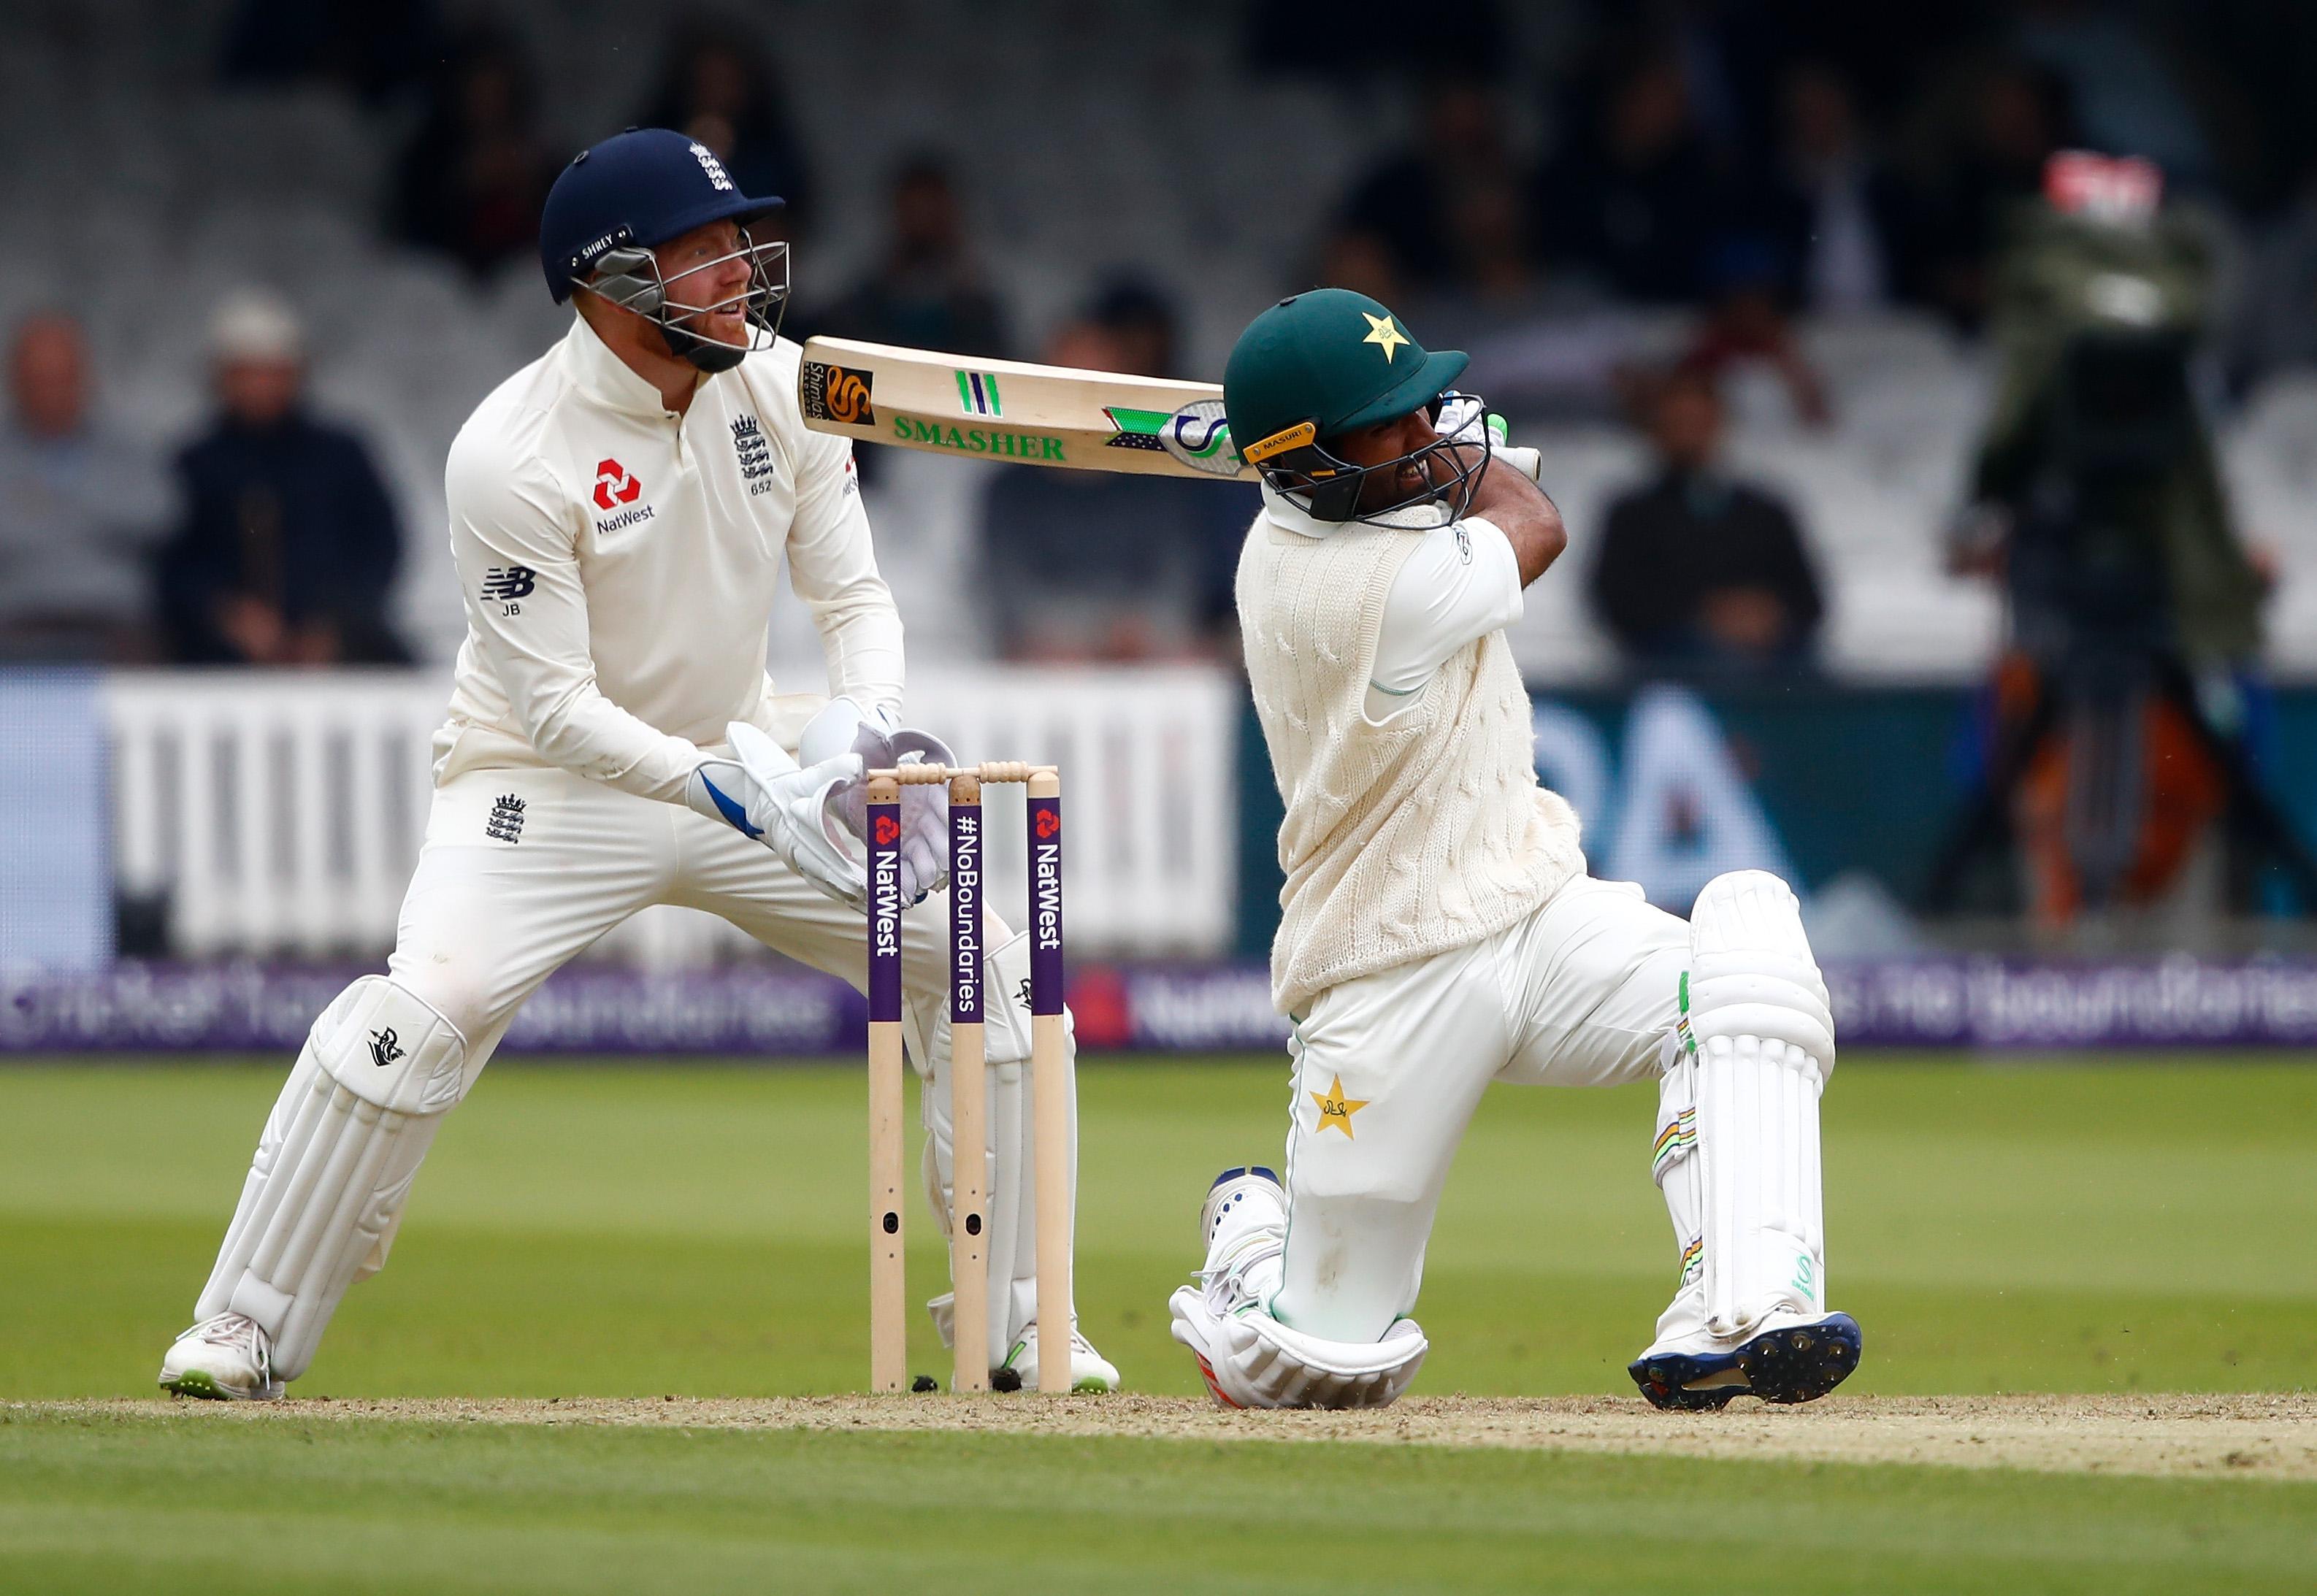 Asad Shafiq hits a six on his way to a half-century